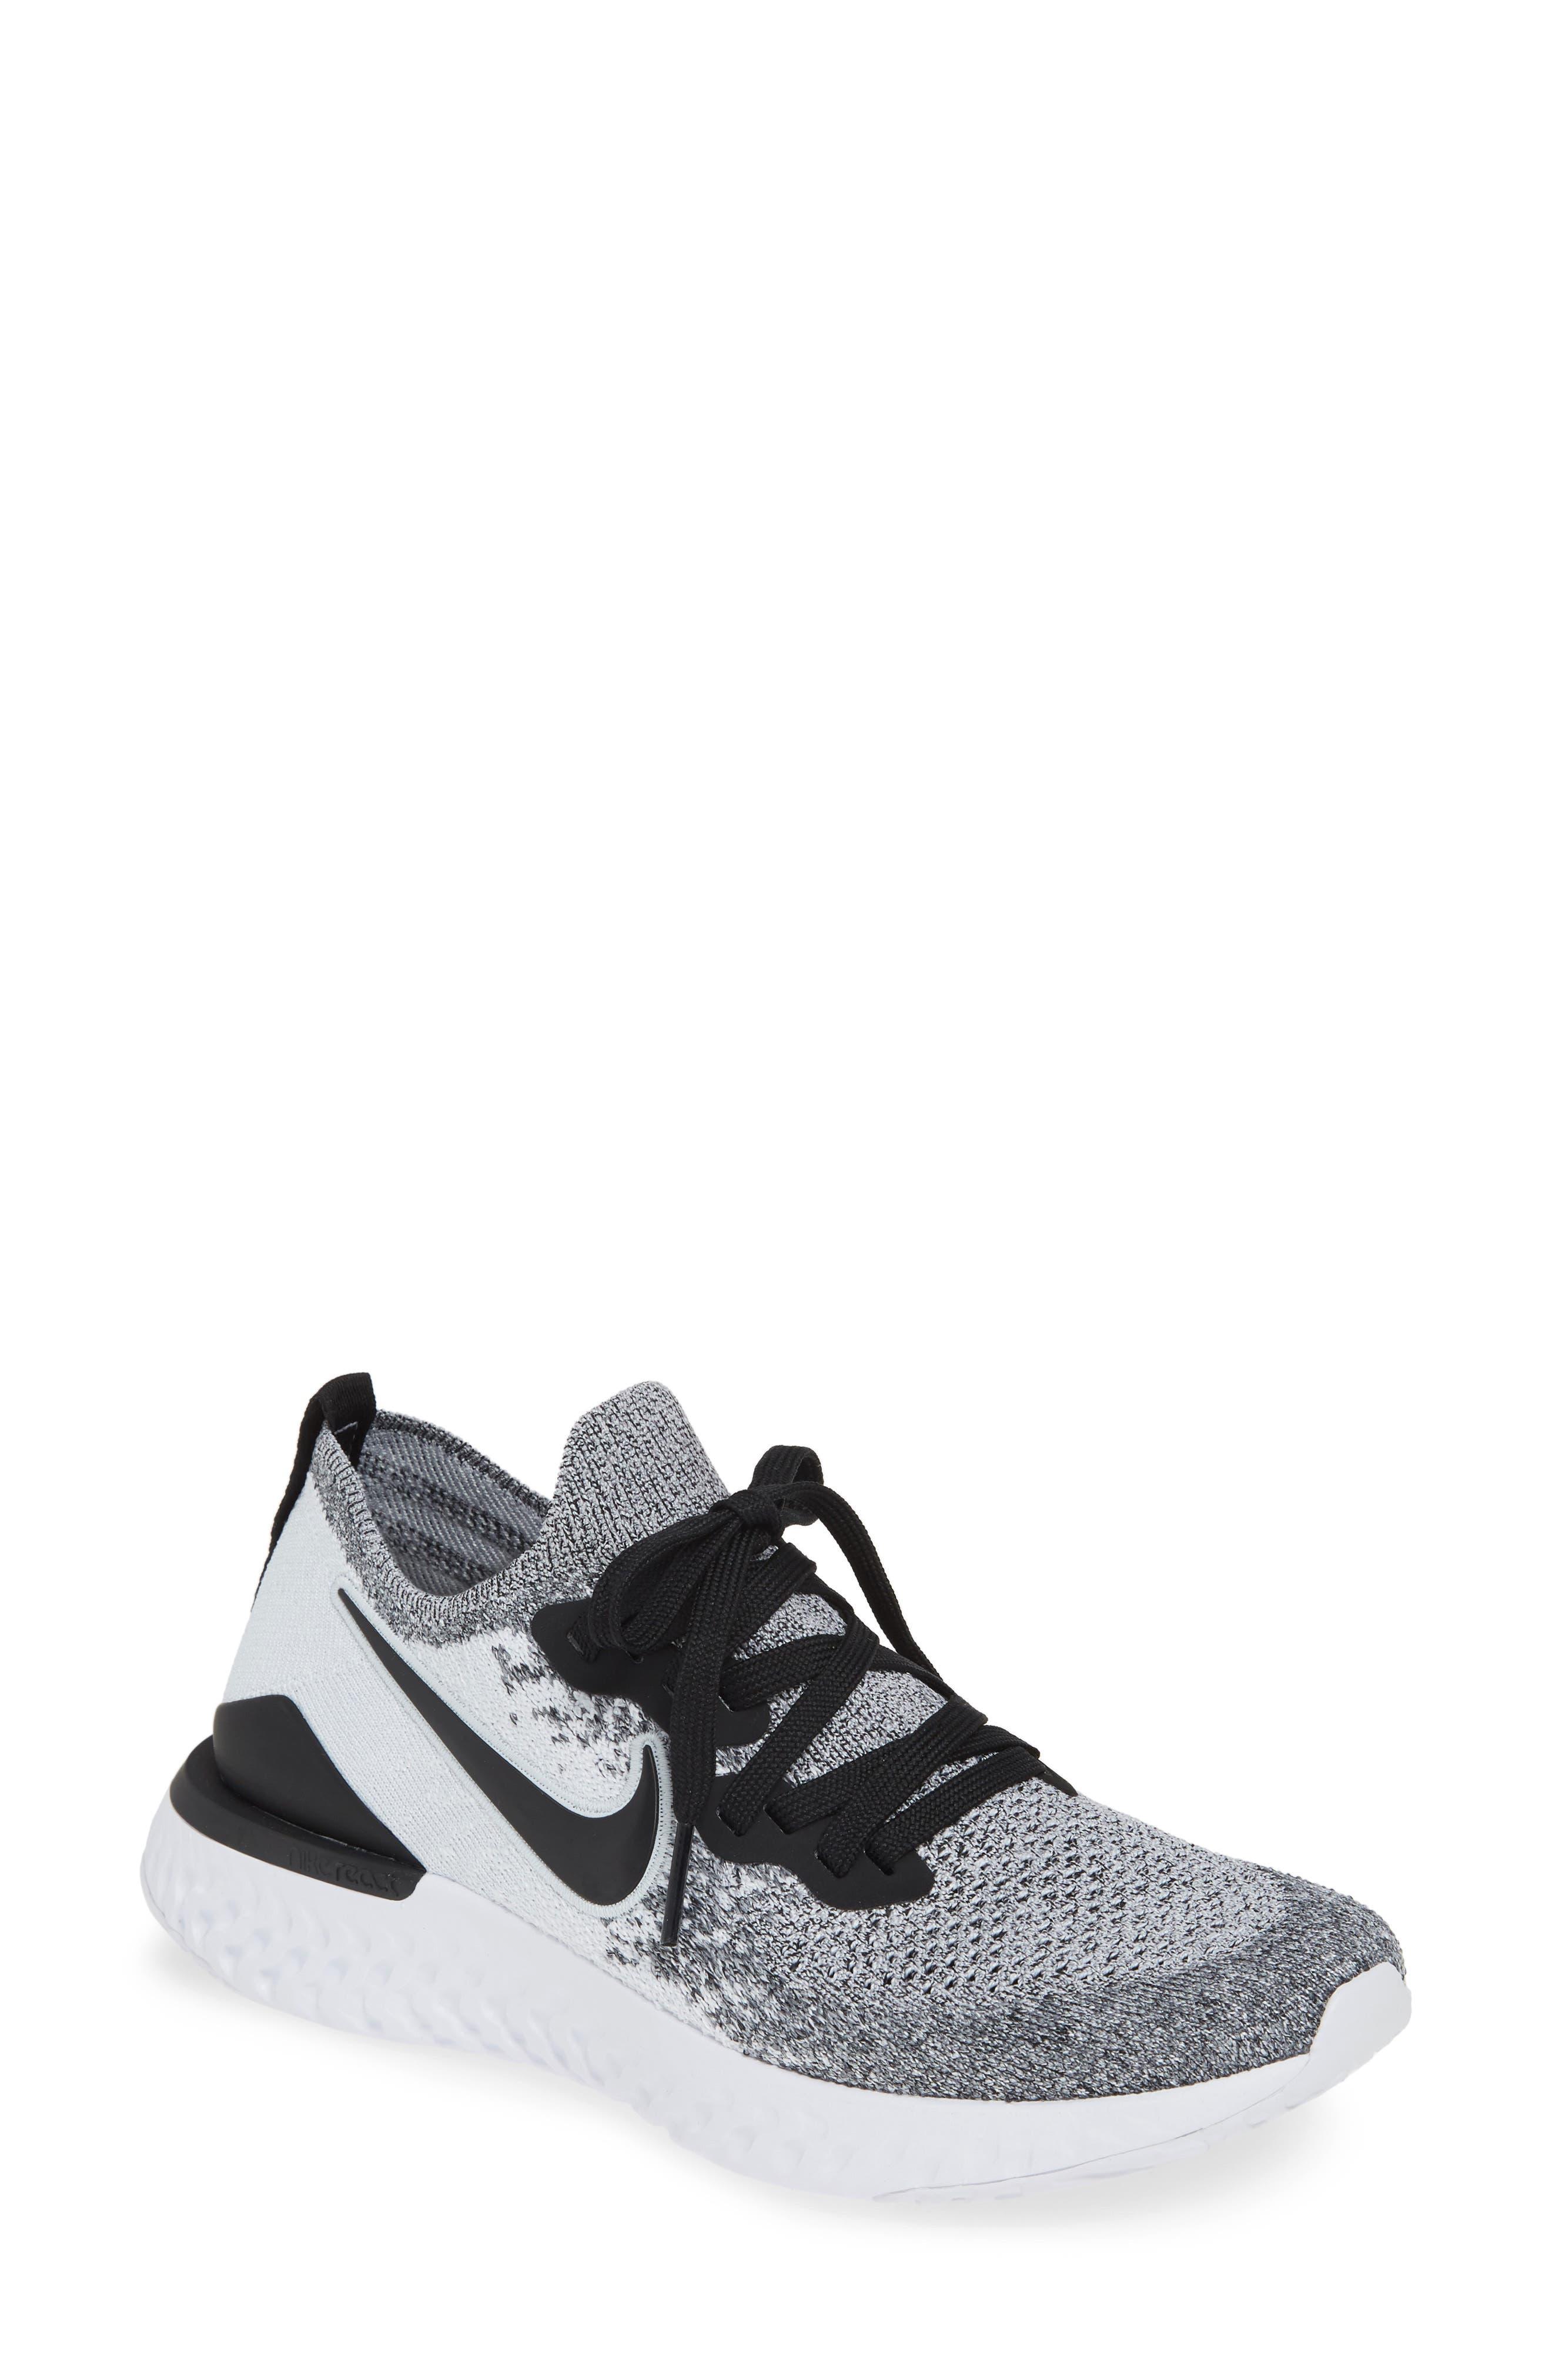 NIKE Epic React Flyknit 2 Running Shoe, Main, color, WHITE/ BLACK/ PURE PLATINUM